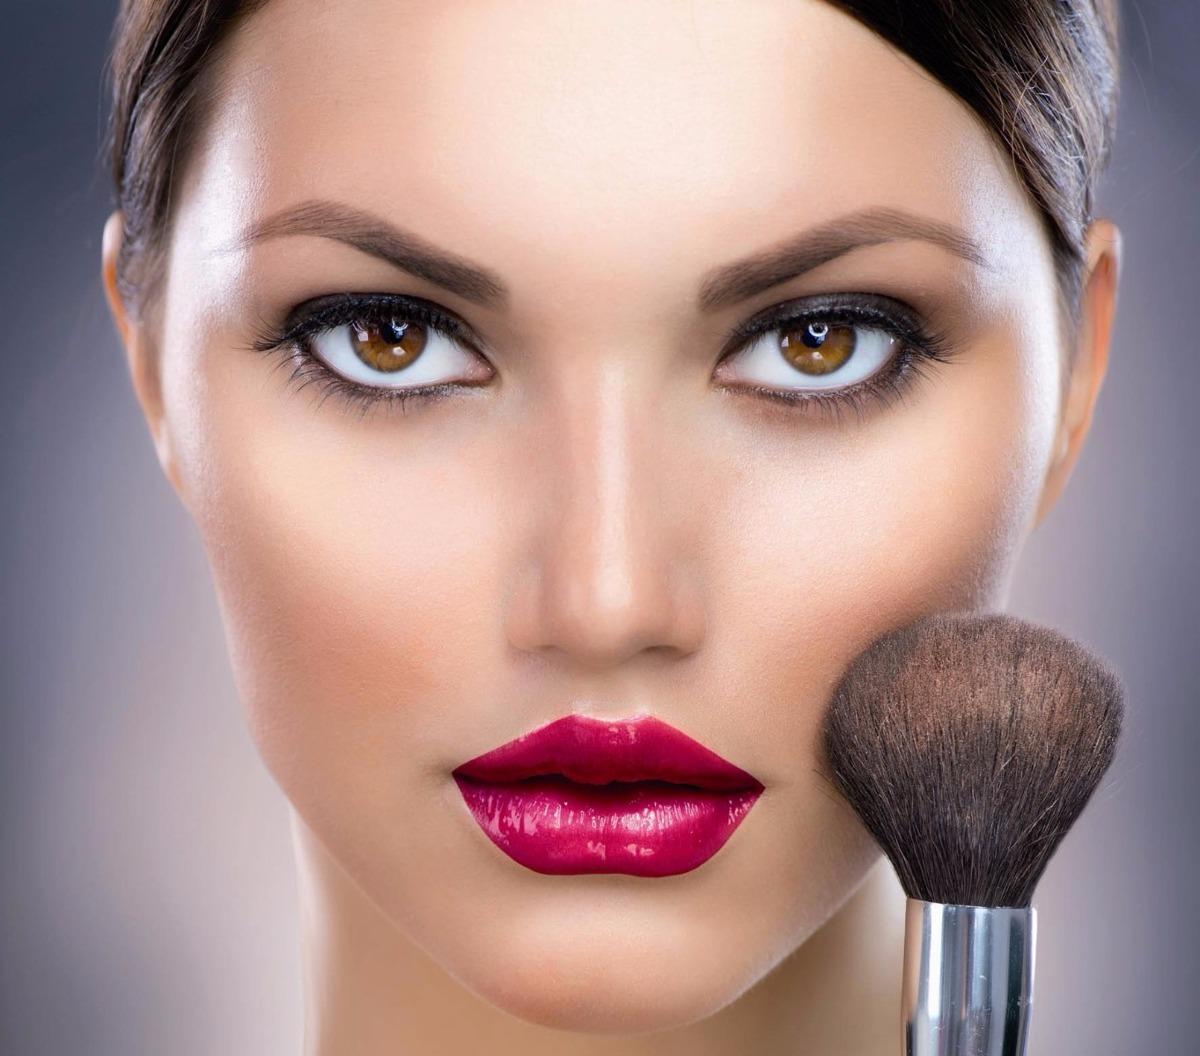 b17a9ec7e curso completo maquillaje profesional rostro labios cejas. Cargando zoom.